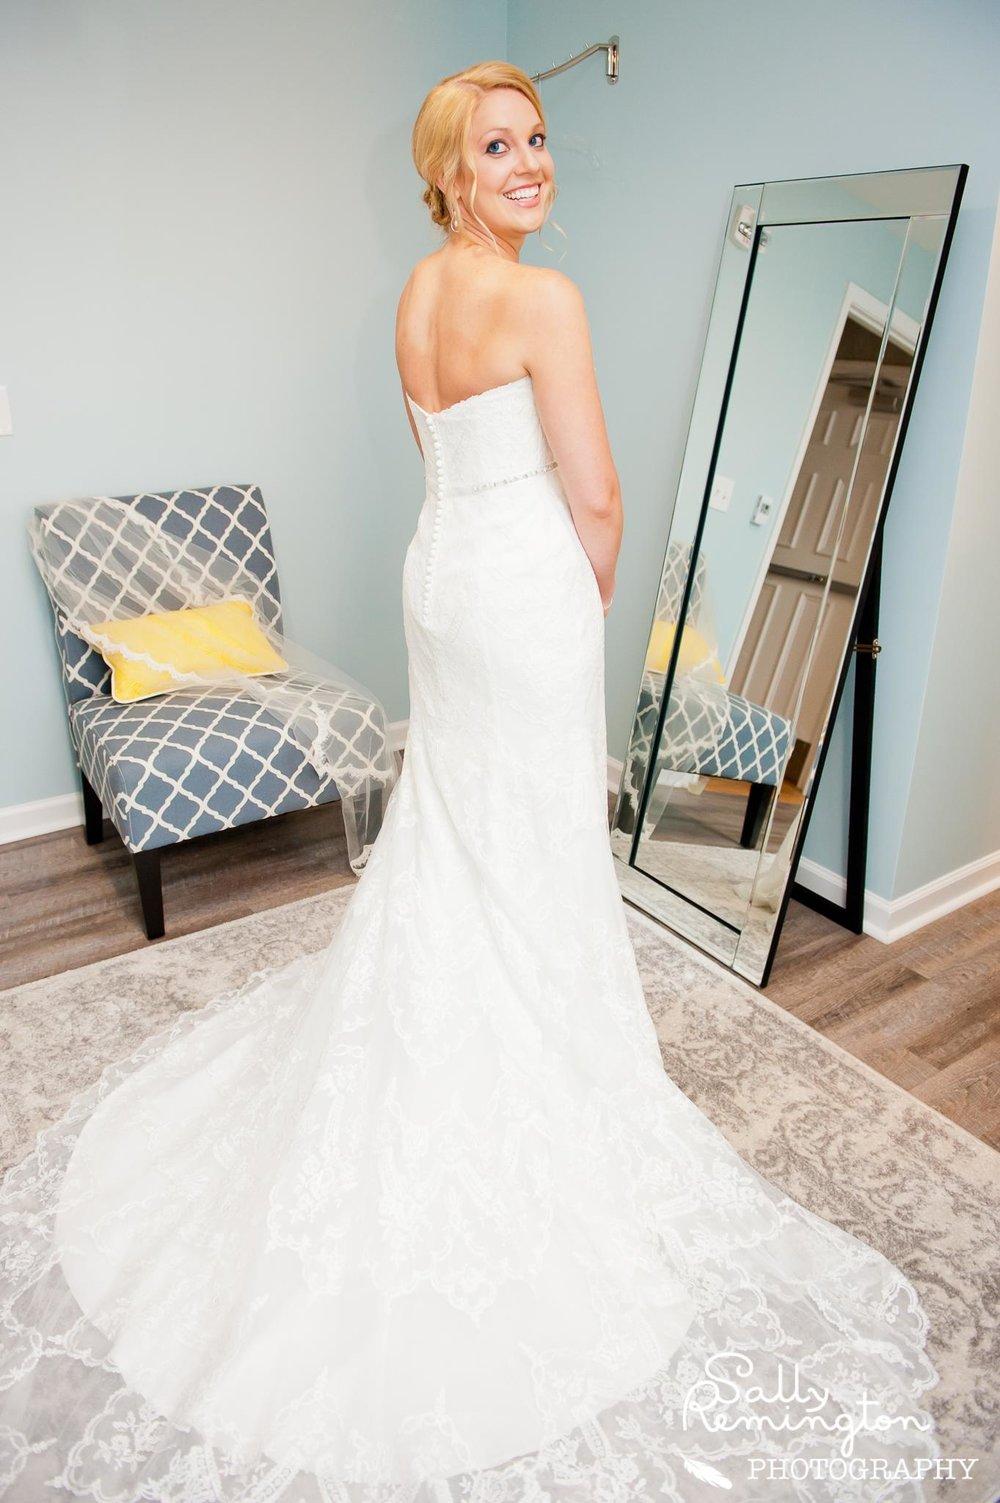 ivory-and-beau-bridal-boutique-savannah-wedding-dress-savannah-wedding-gown-kirstie-maggie-sottero-real-maggie-sottero-bride-beach-wedding-sarah-remington-photography-2.jpg